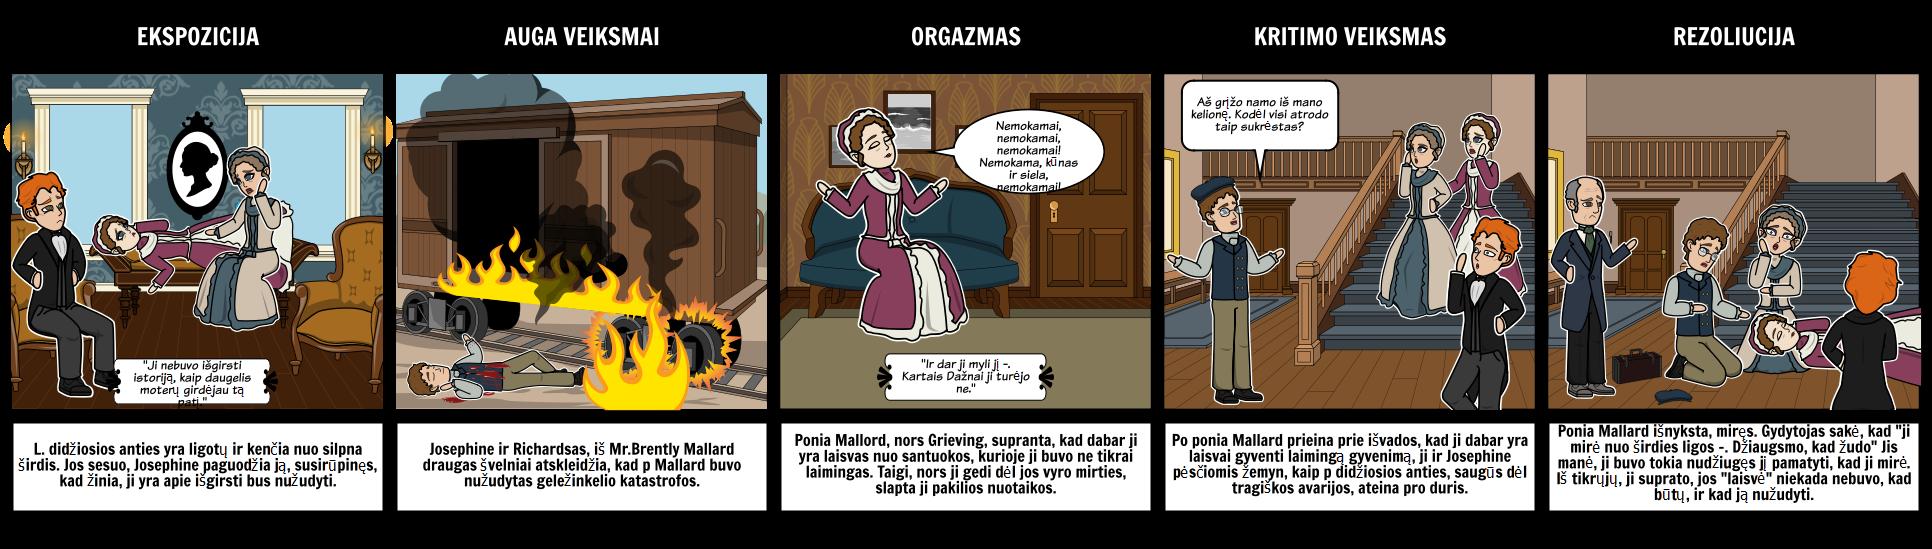 Iš Valandą Sklypo Diagrama Istorija